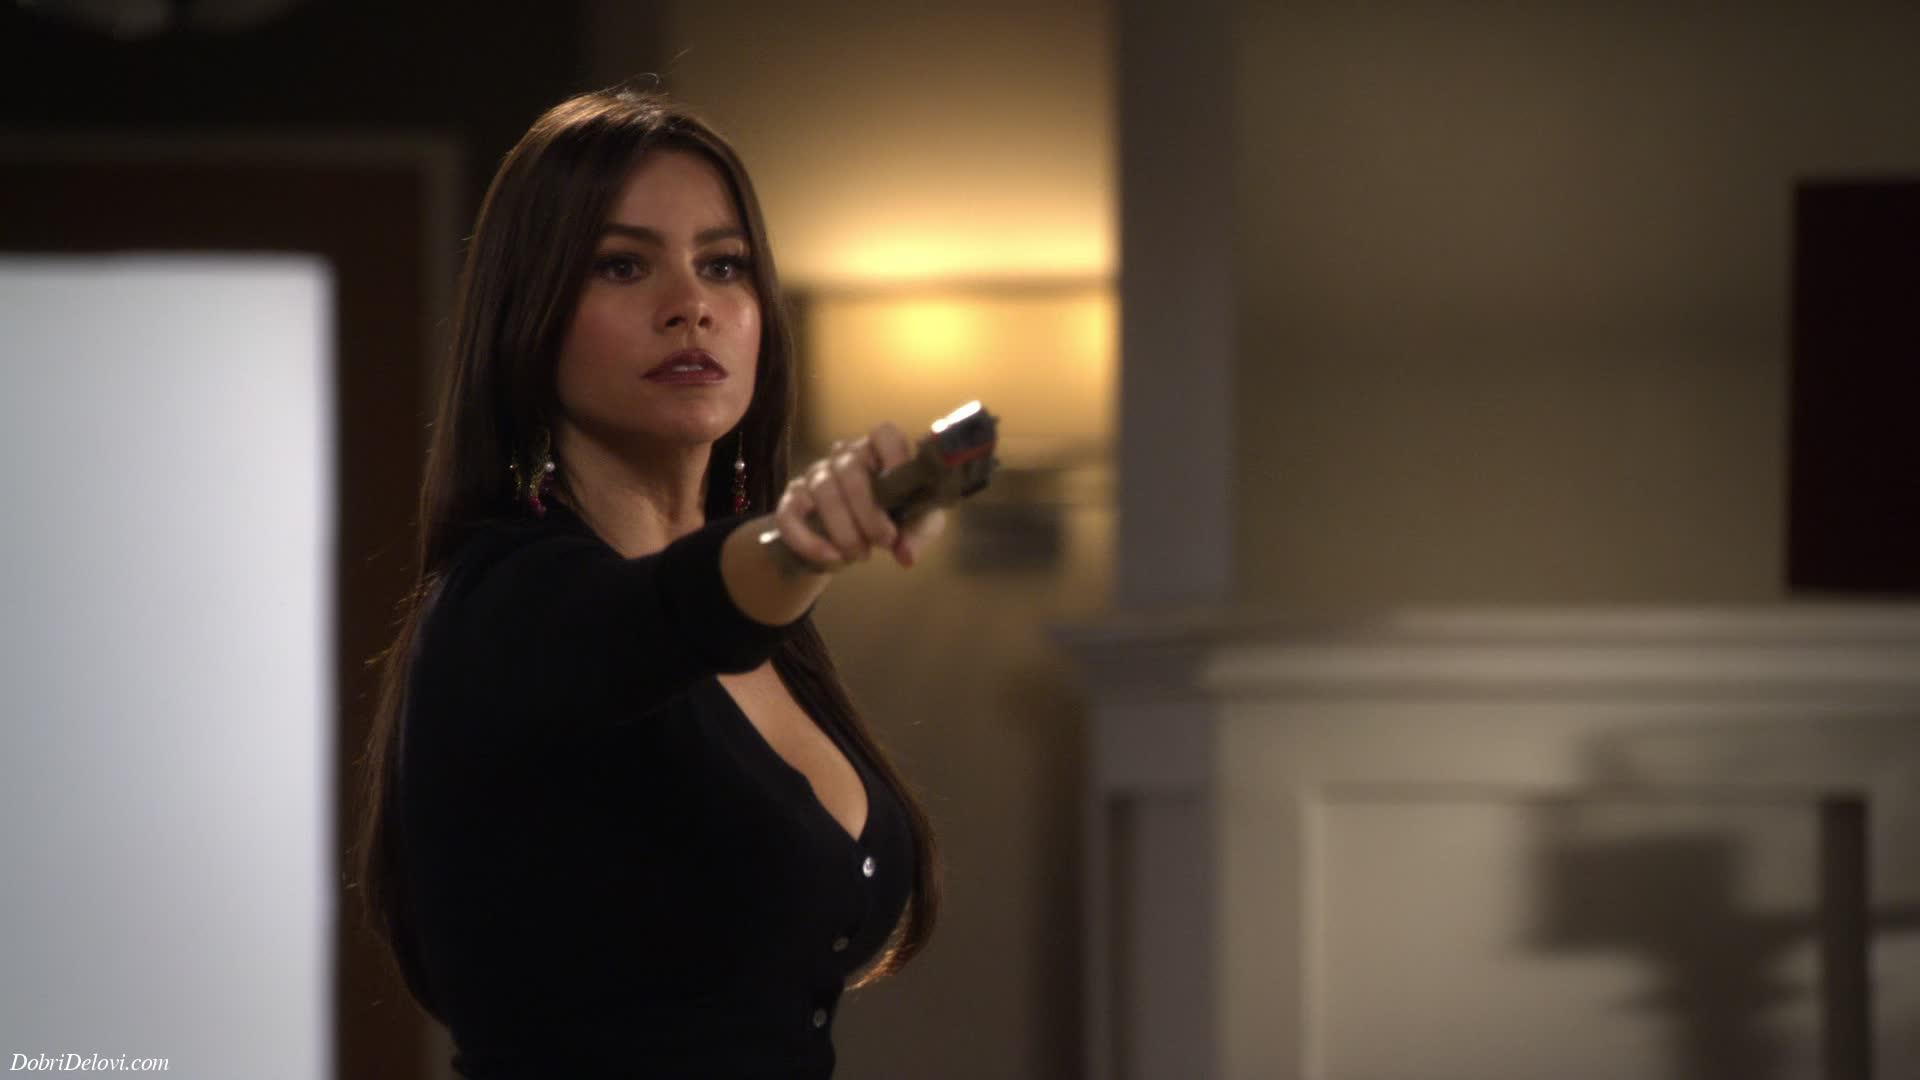 Sofia Vergara soots the nerf gun scene from Modern Family